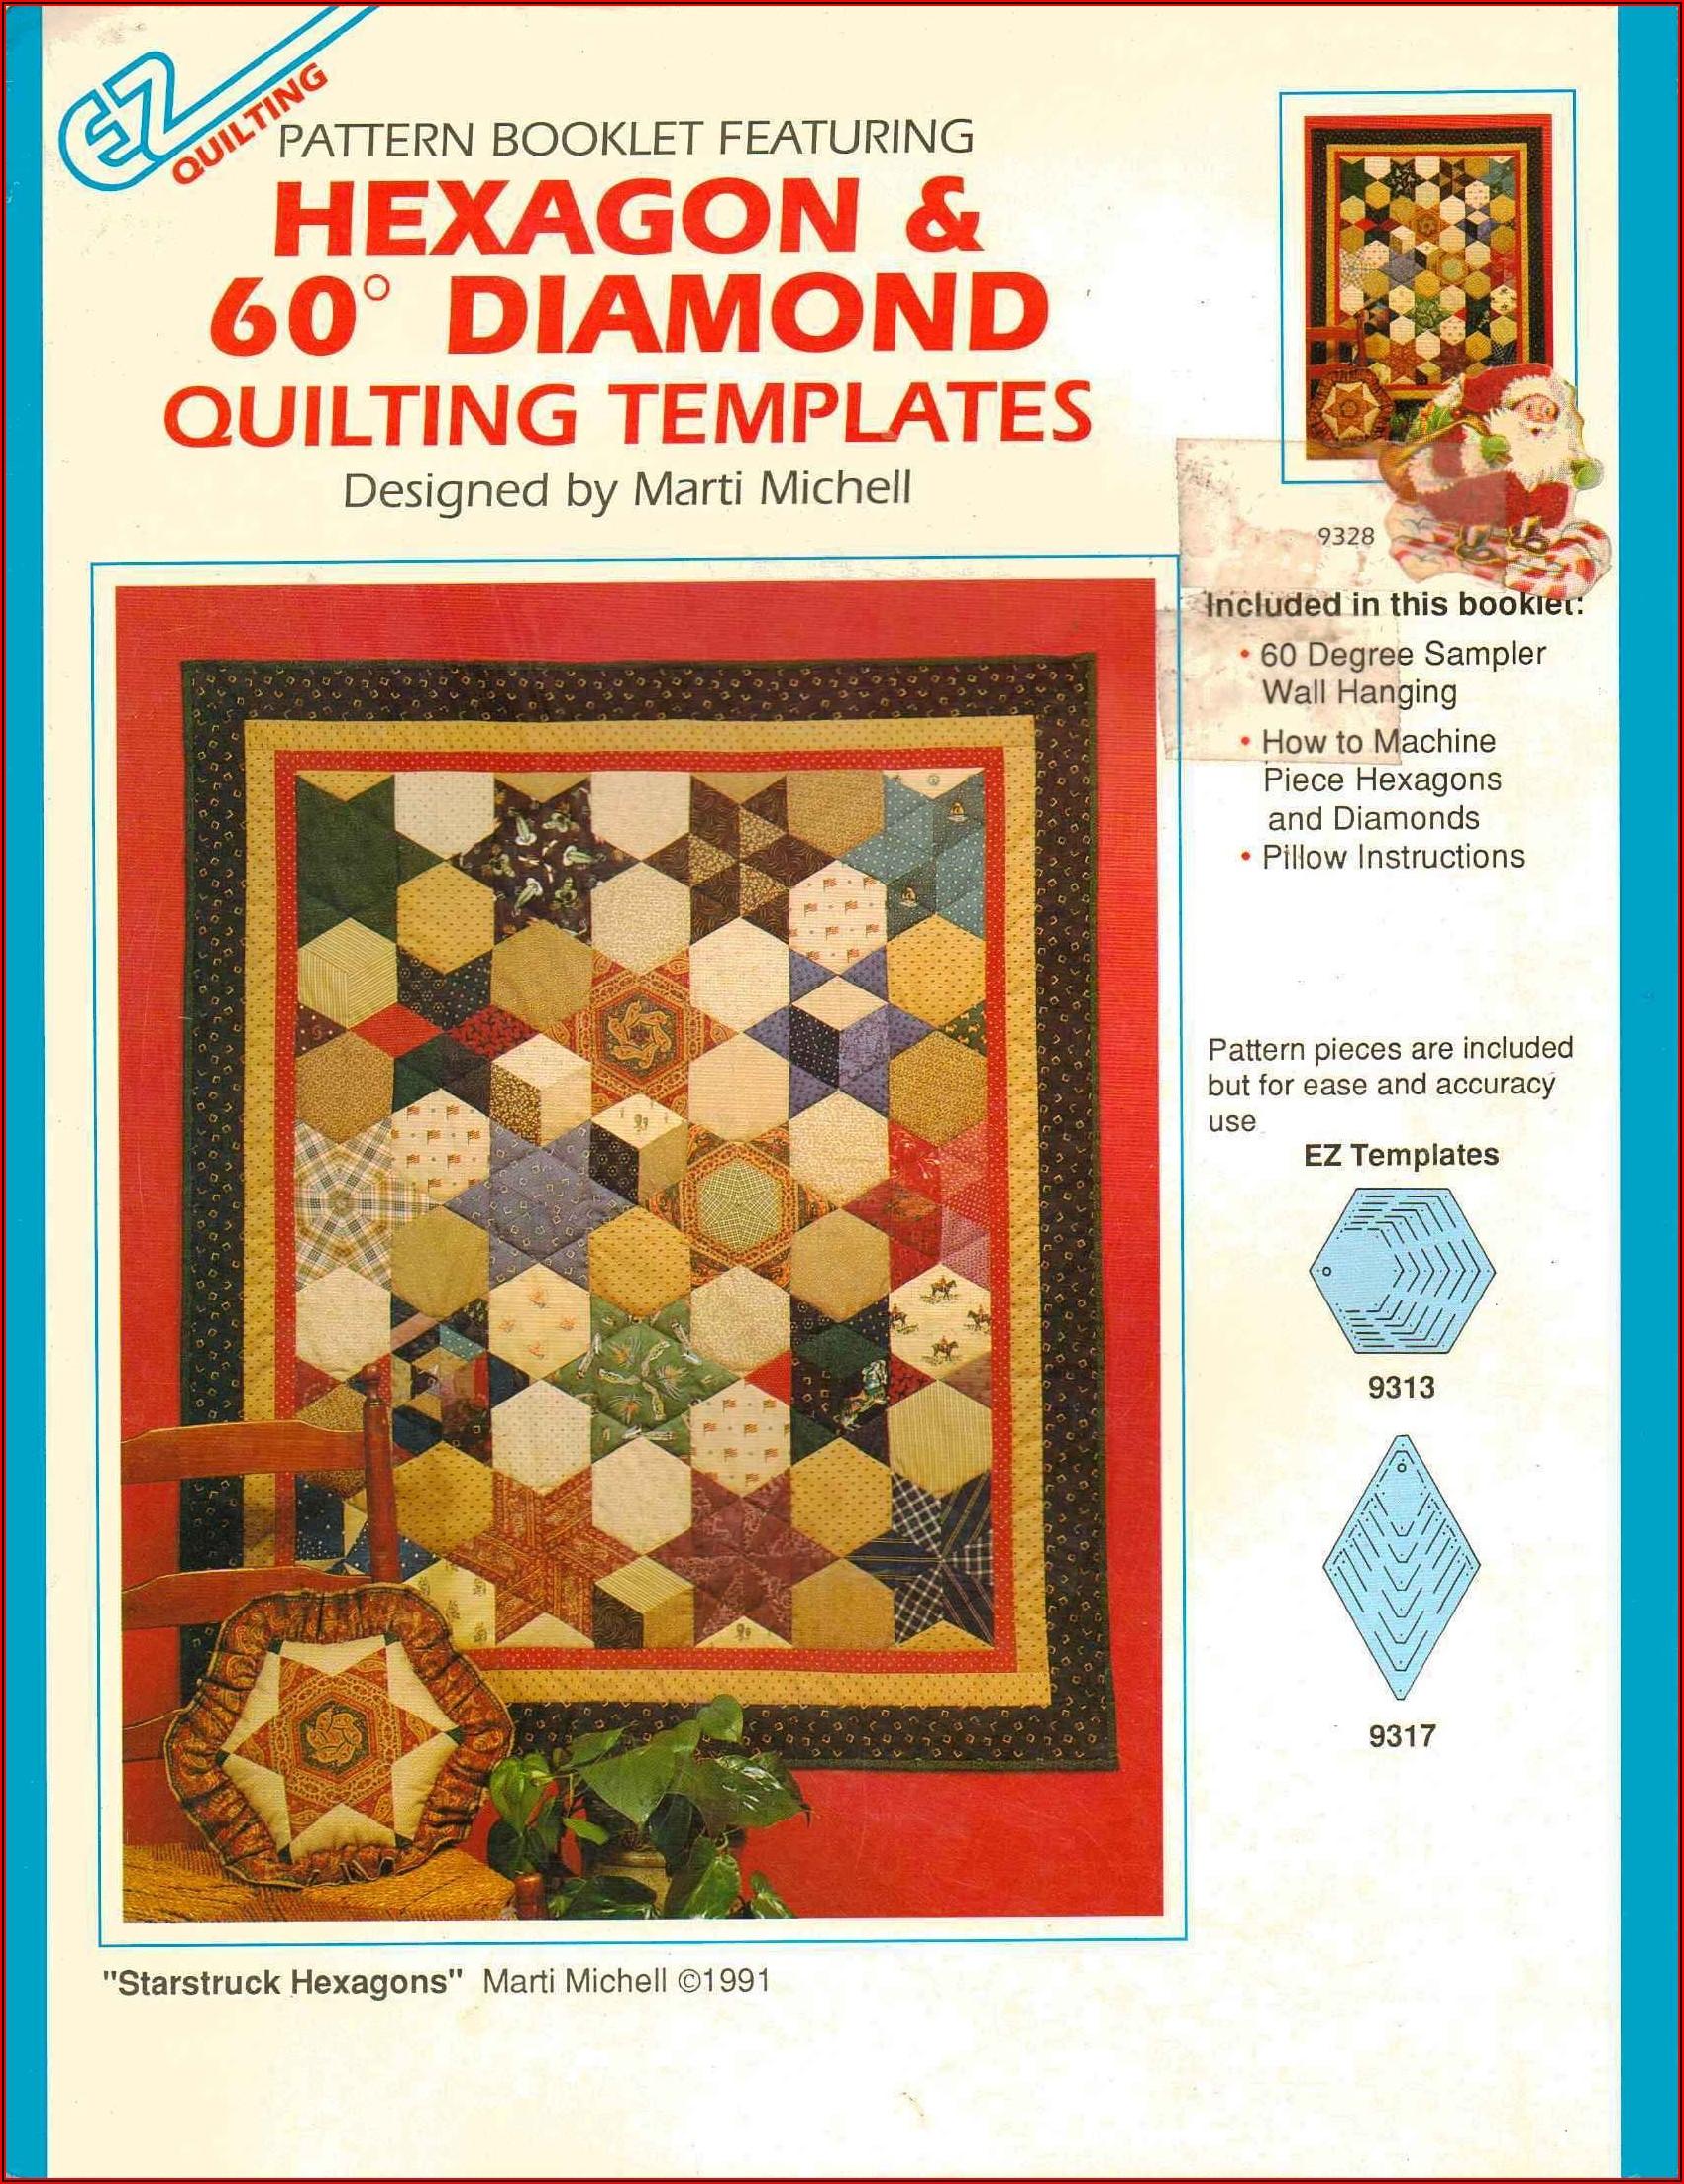 Hexagon Quilting Pattern